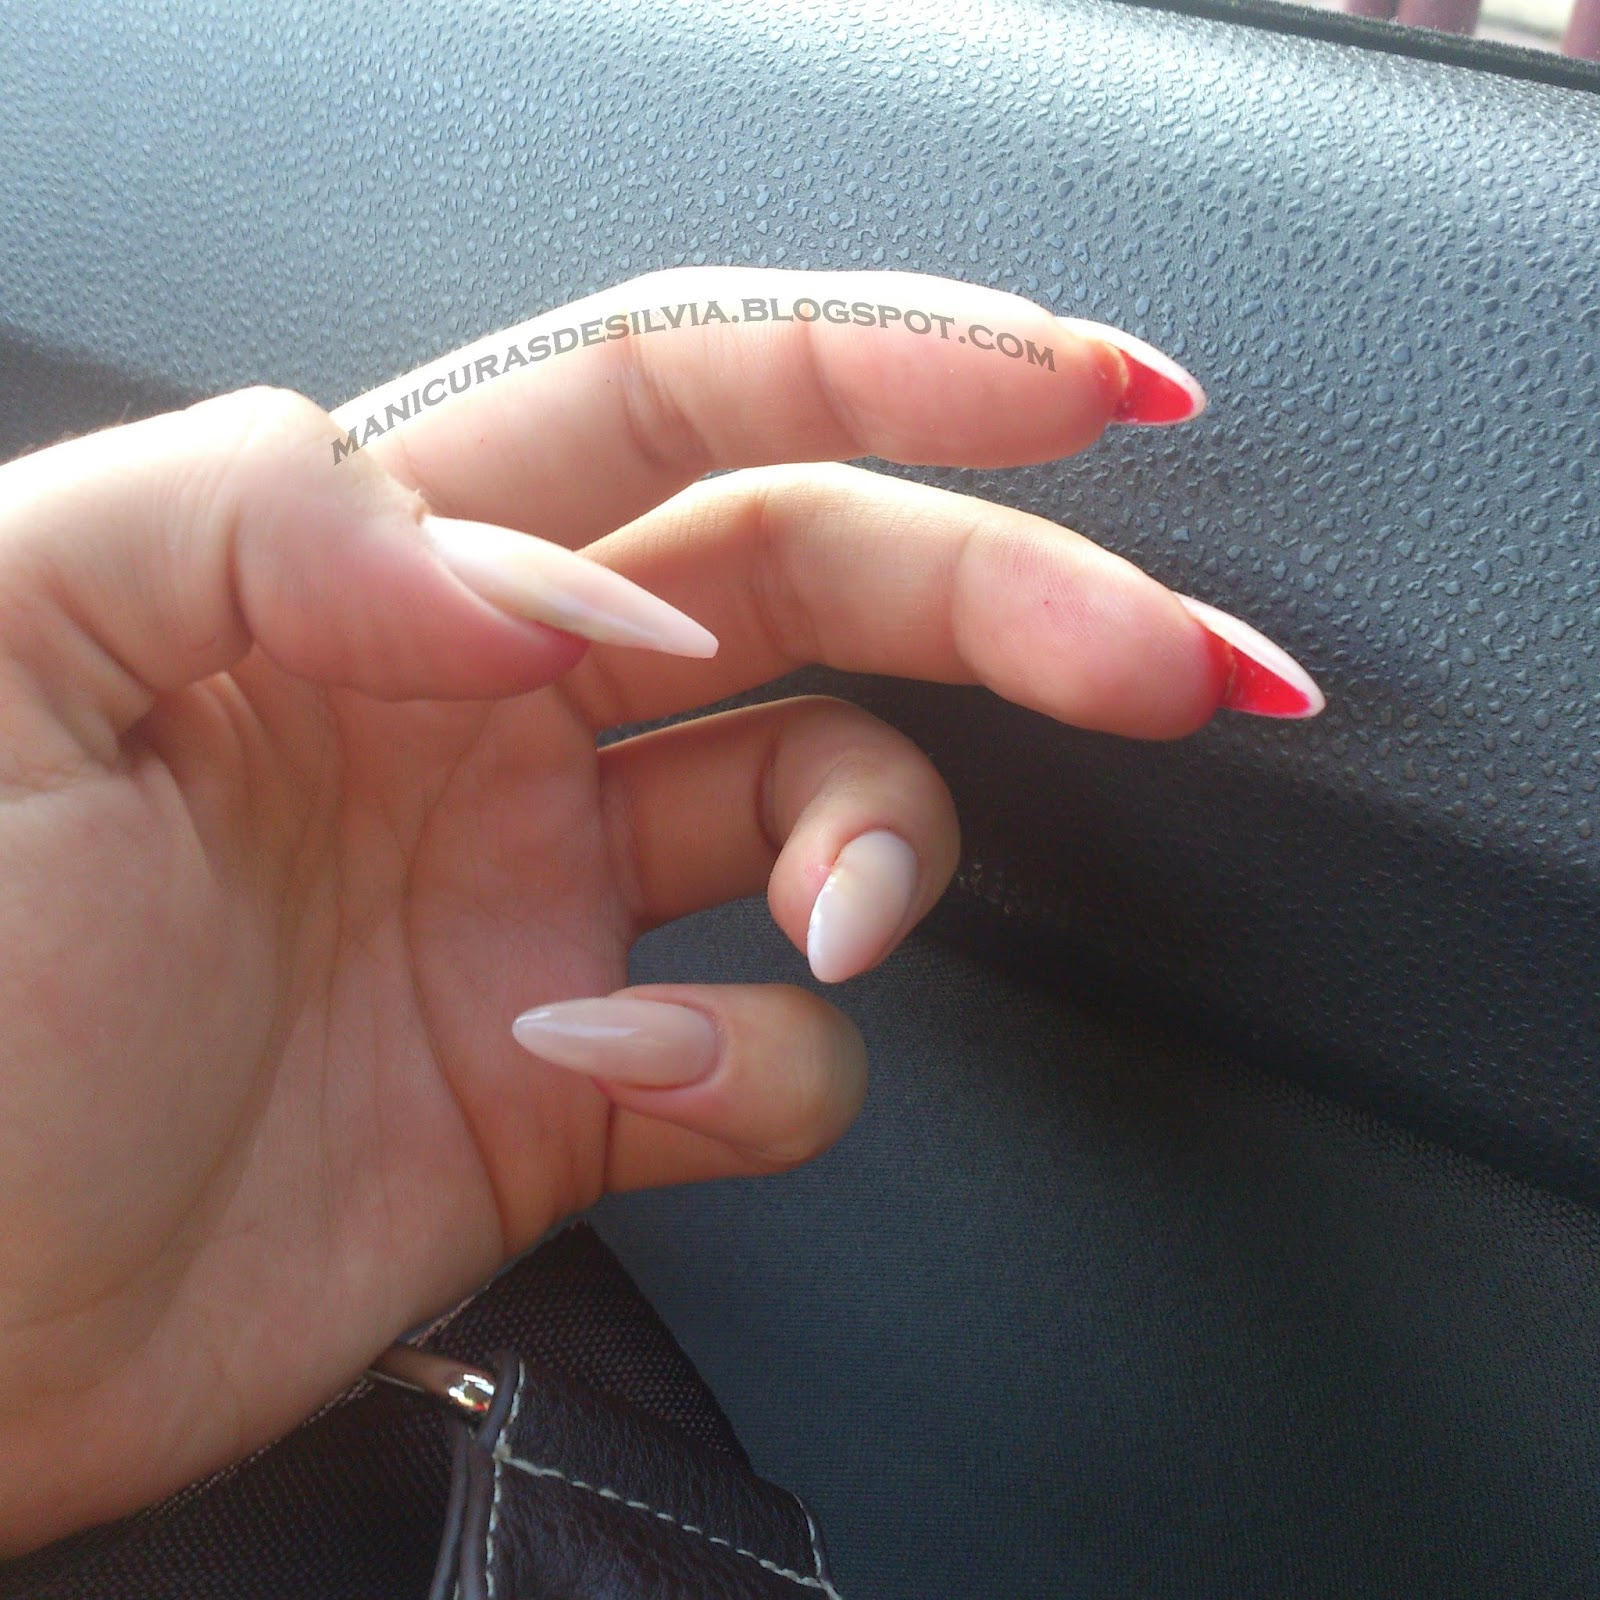 Manicuras De Silvia Unas De Malefica Maleficent Nails